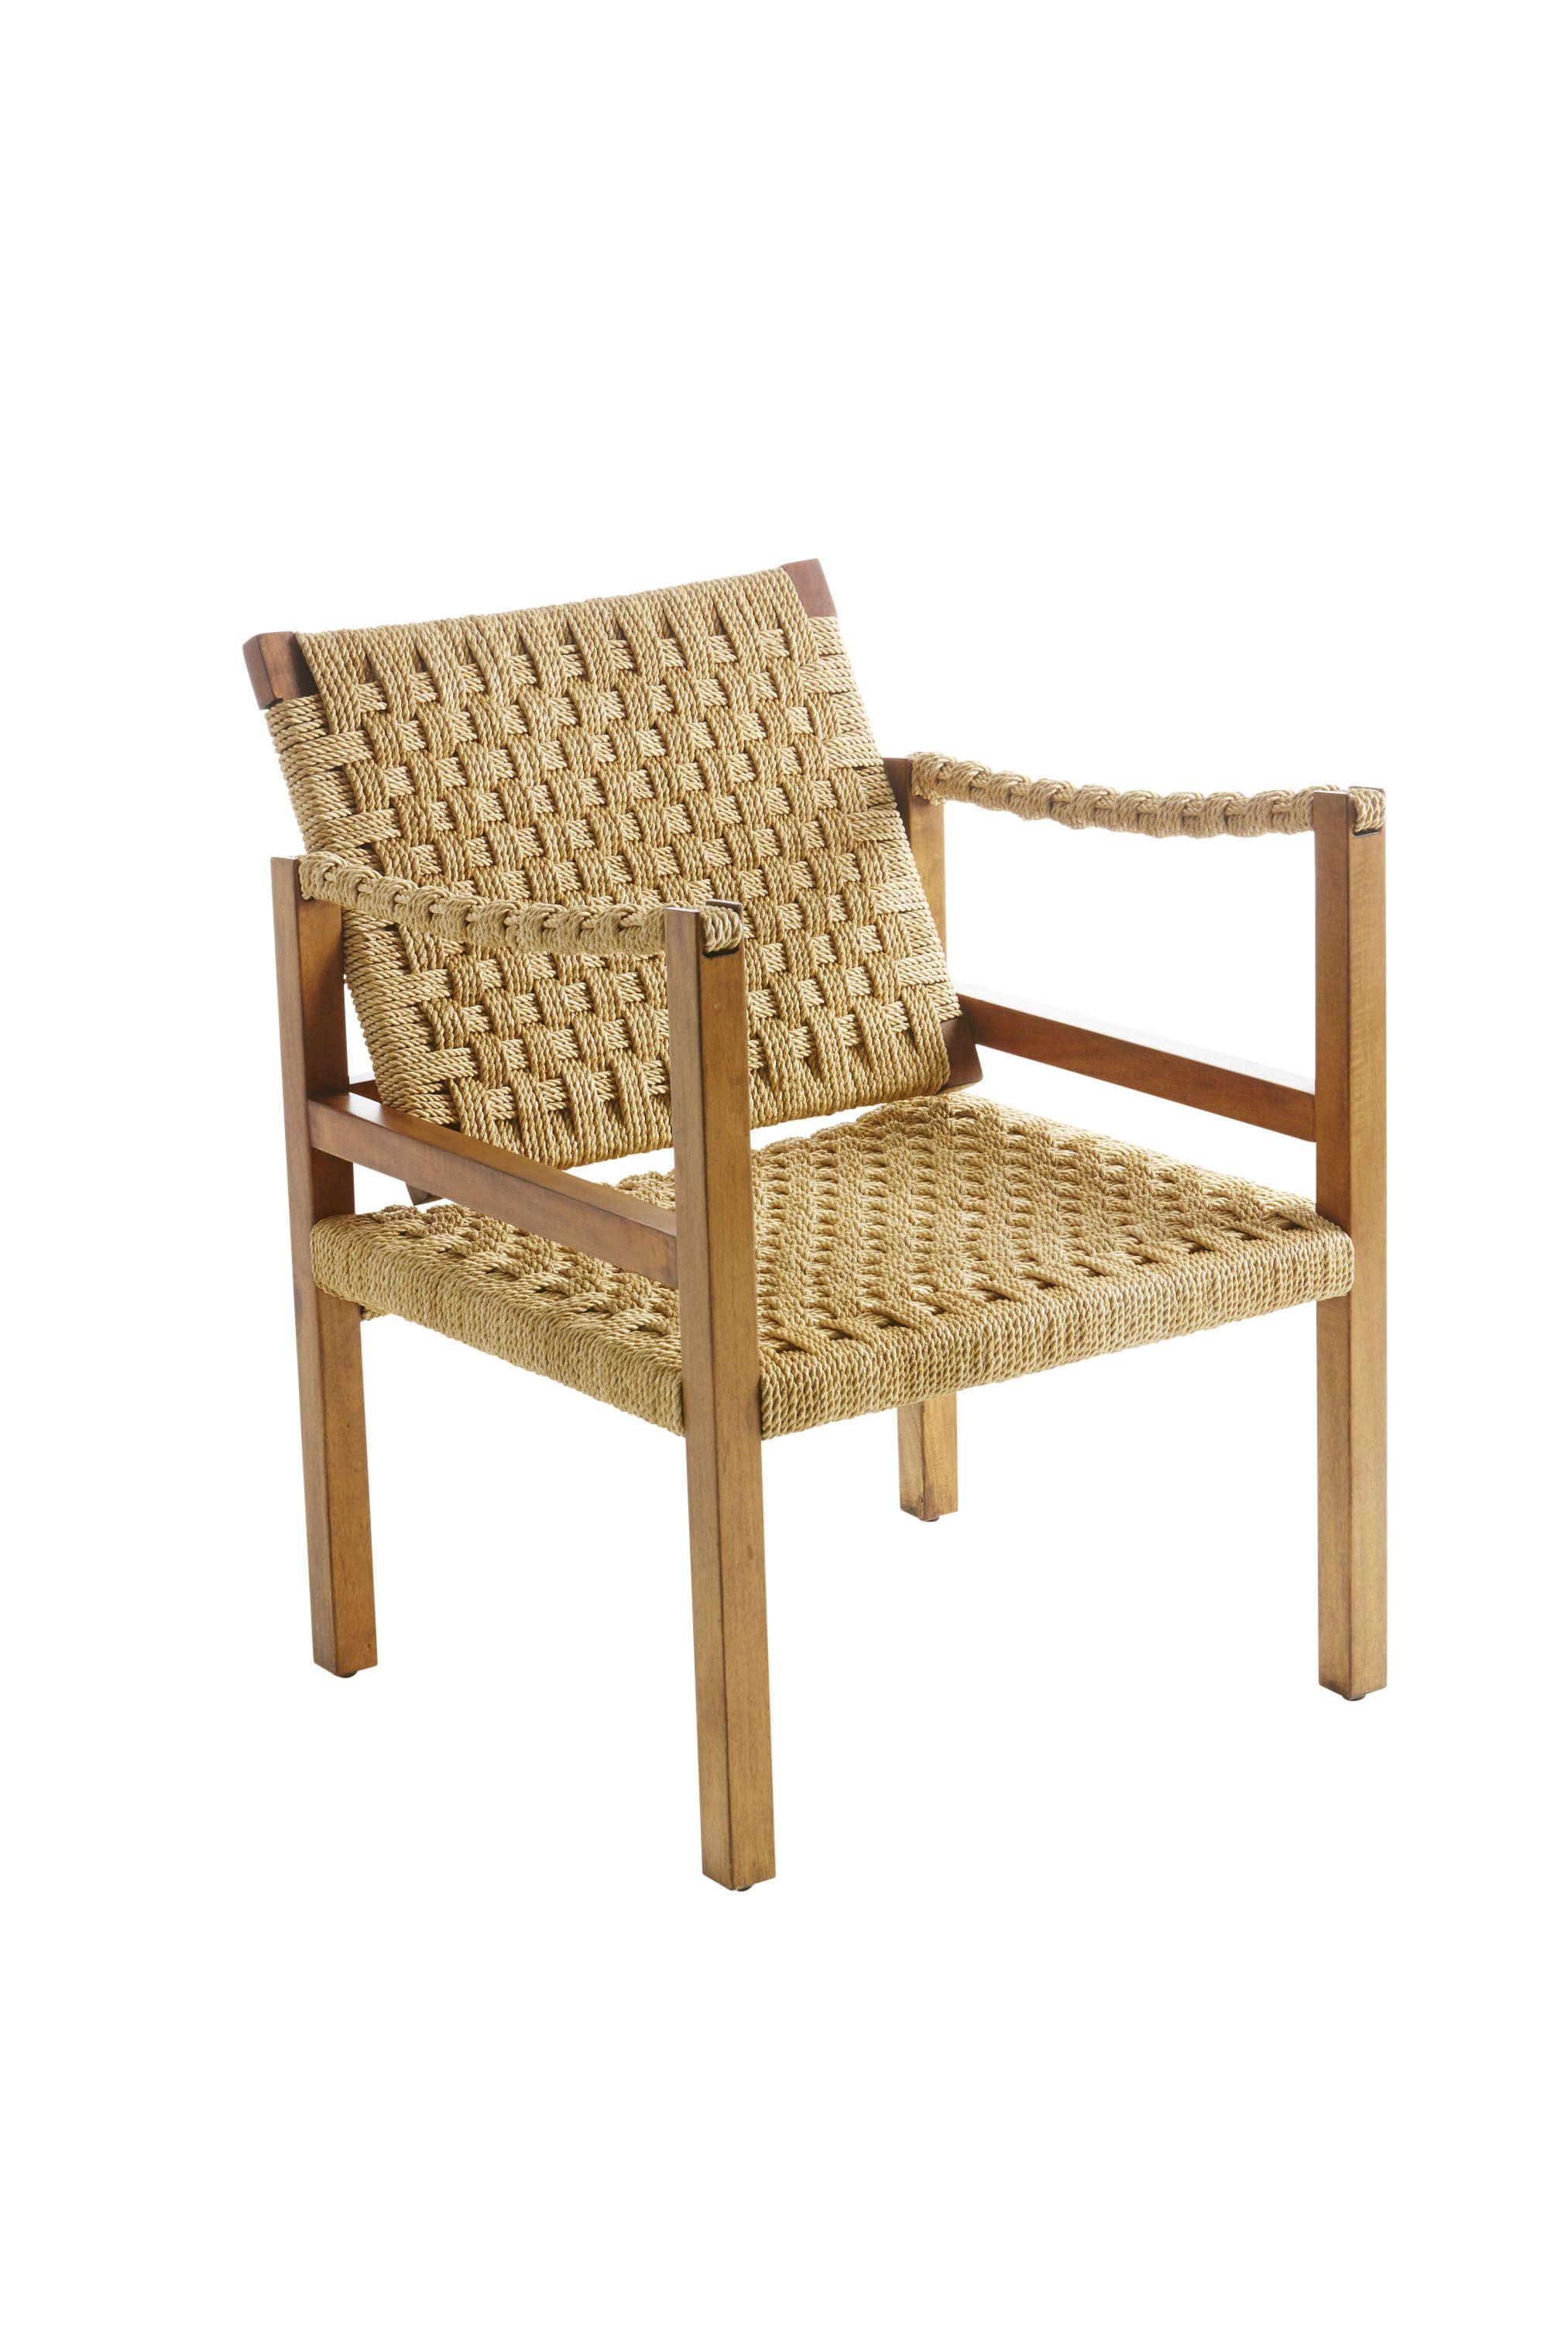 10 Rope Furniture Pieces For Nautical Decor   Best Beach Decor And Designer  Furniture